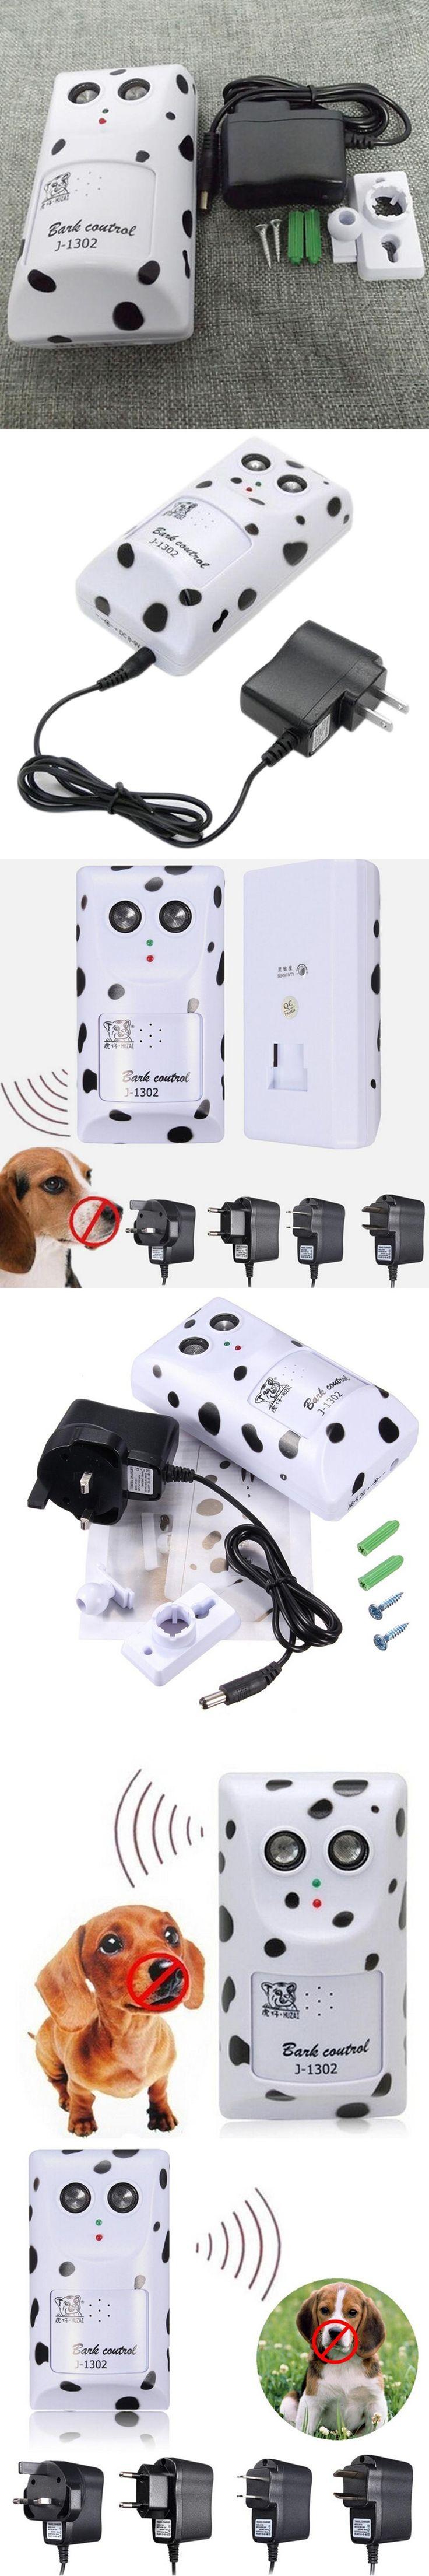 High quality Humanely Ultrasonic Anti No Bark Device Stop Control Dog Barking Silencer Hanger On Sale